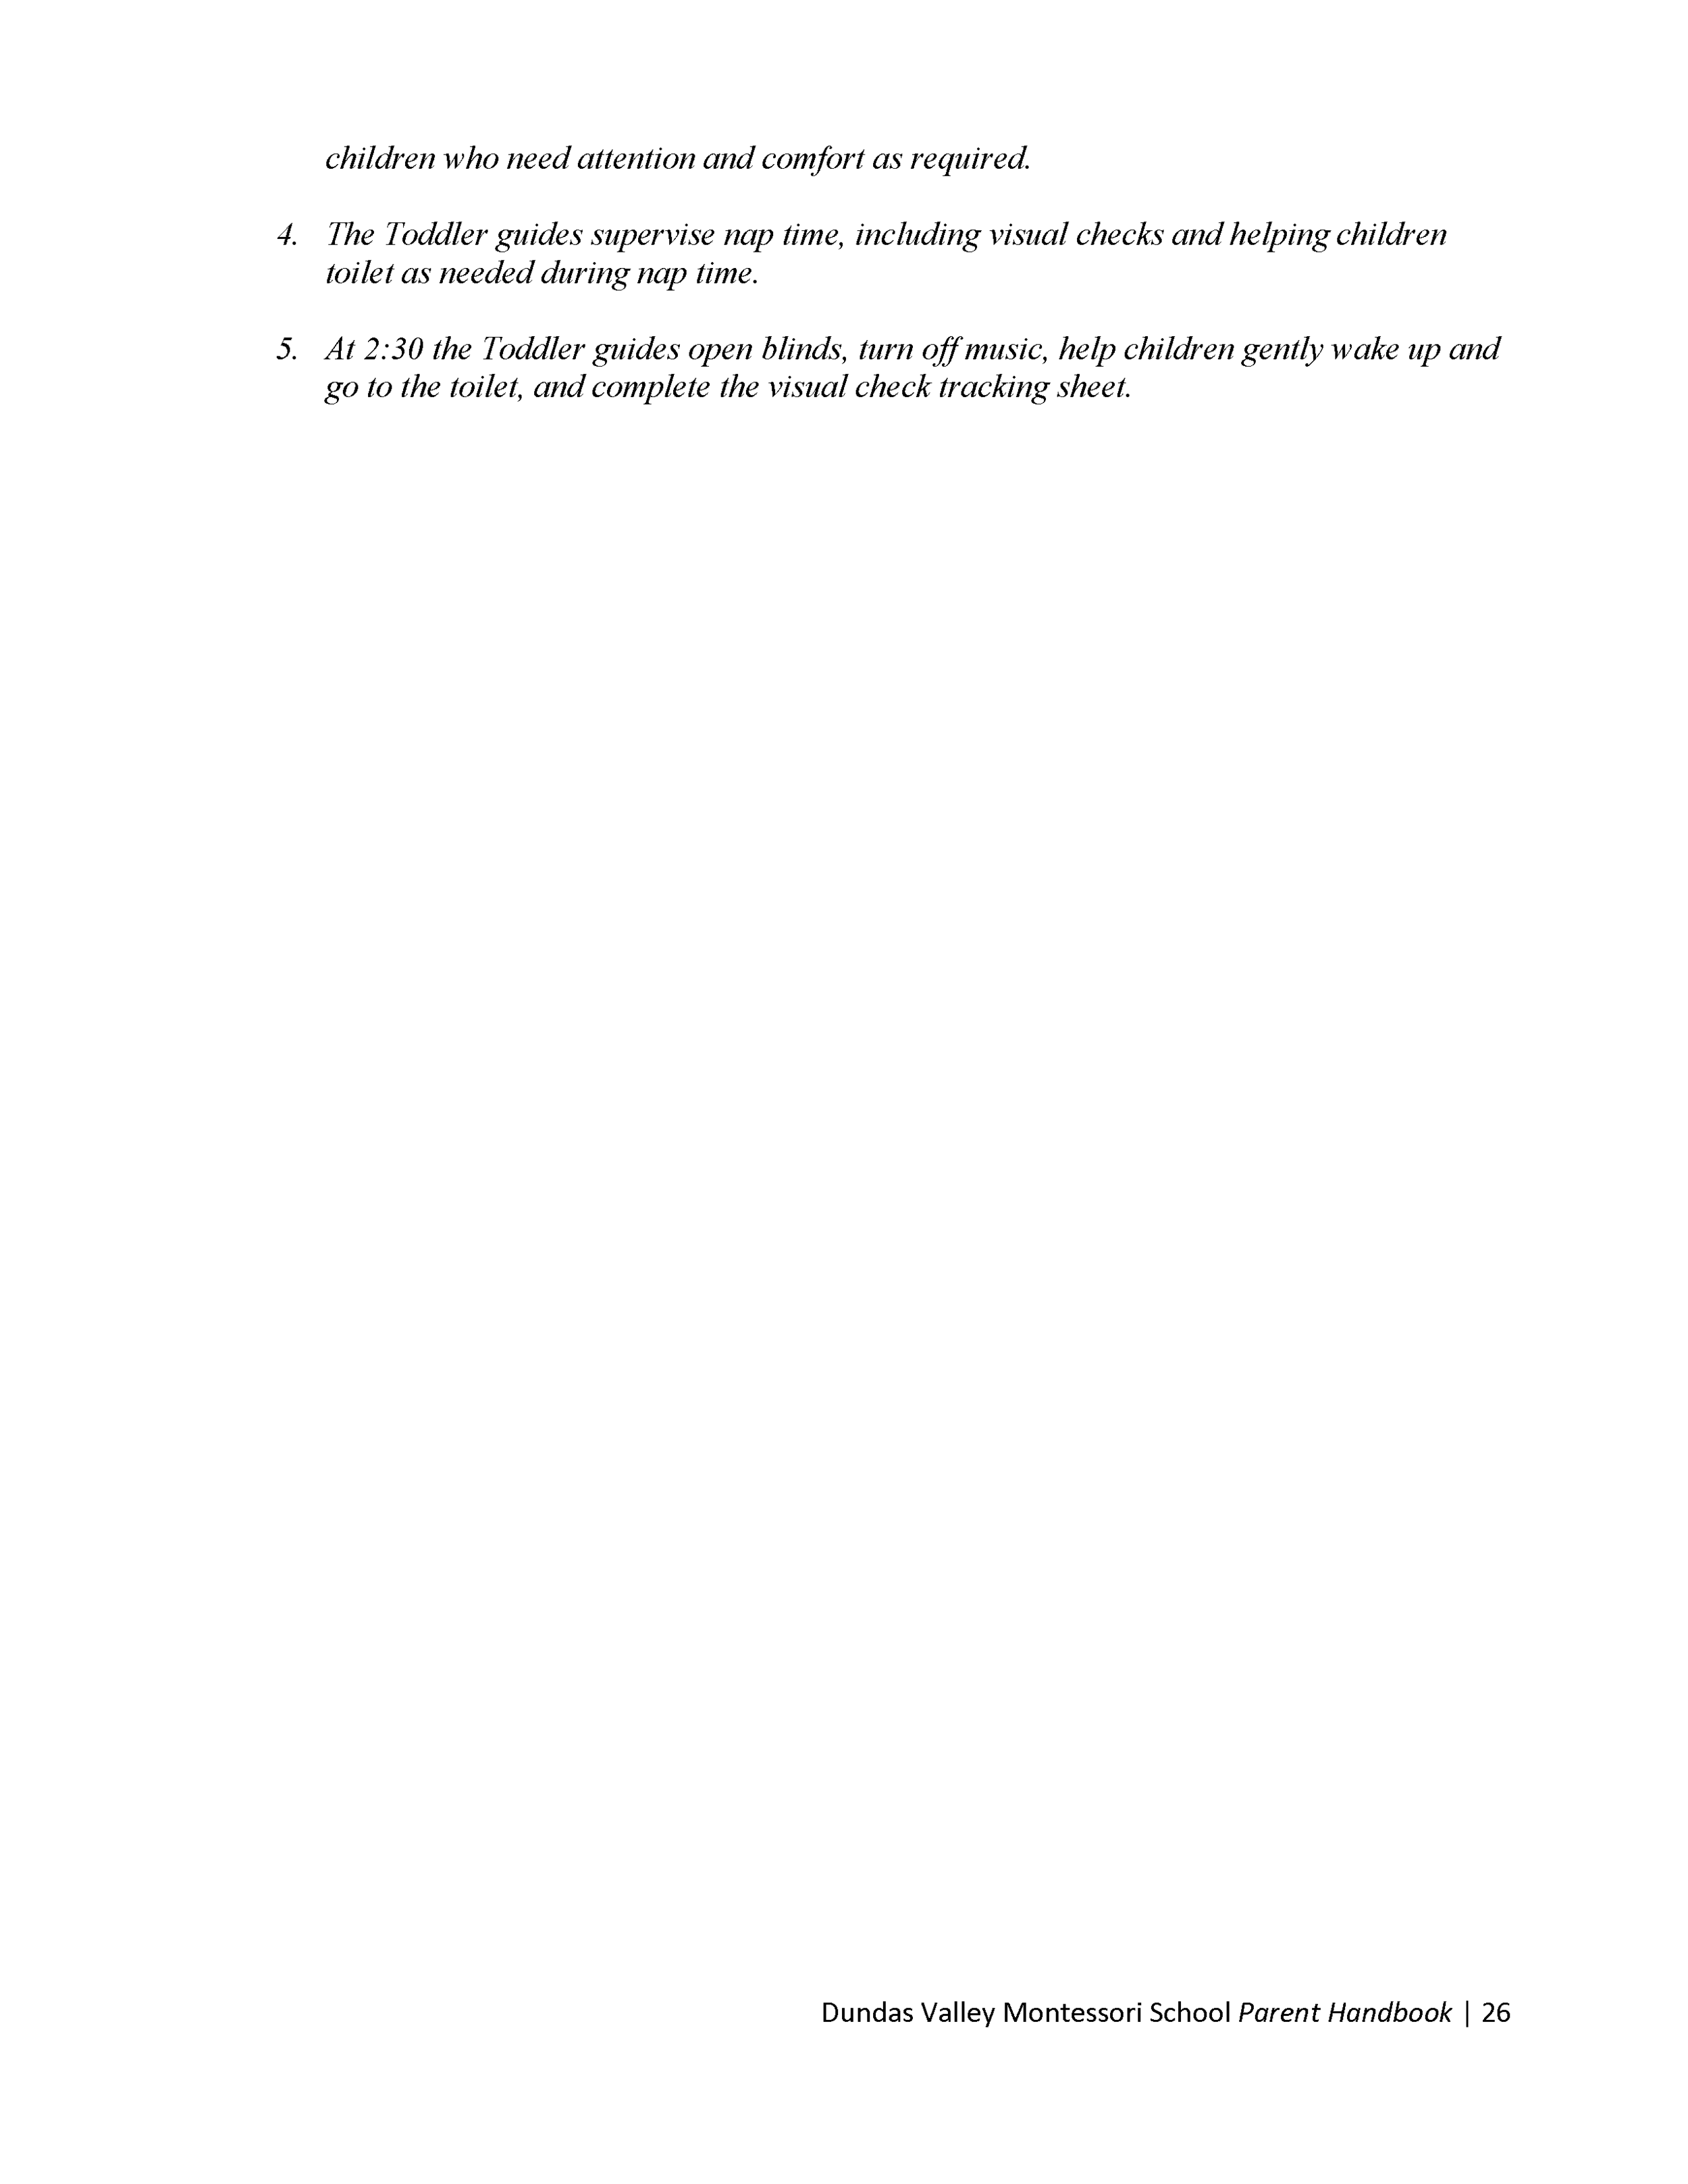 DVMS-Parent-Handbook-19-20_Page_028.png